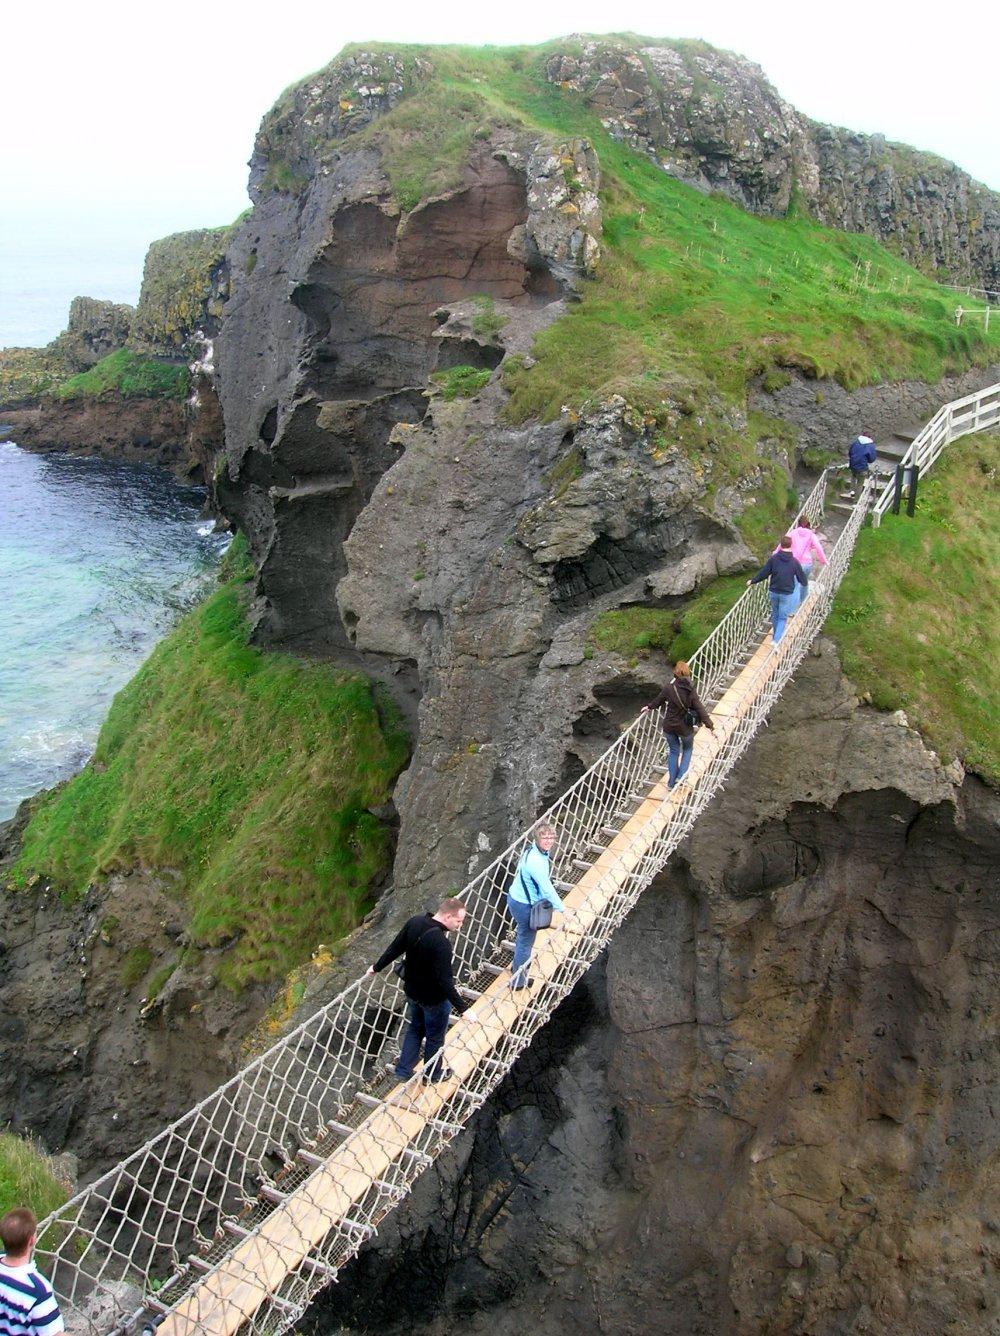 Carrick-a-Rede Rope Bridge, N.Ireland